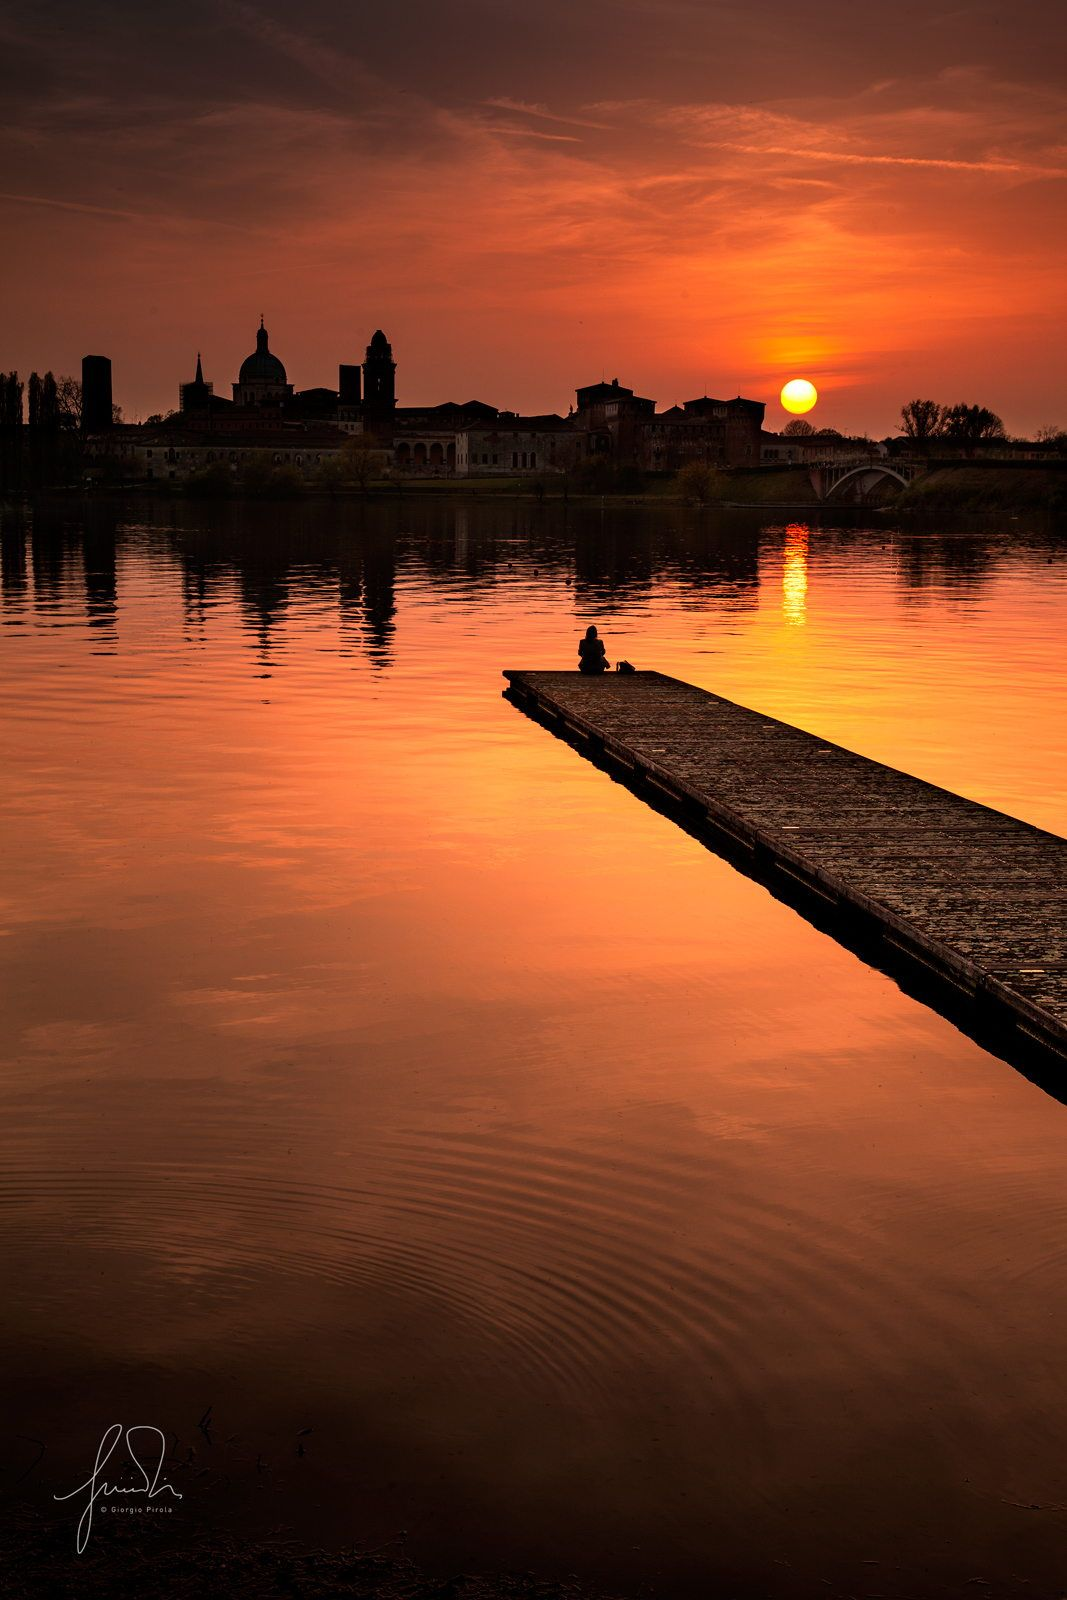 Mantova sunset by Giorgio Pirola on 500px